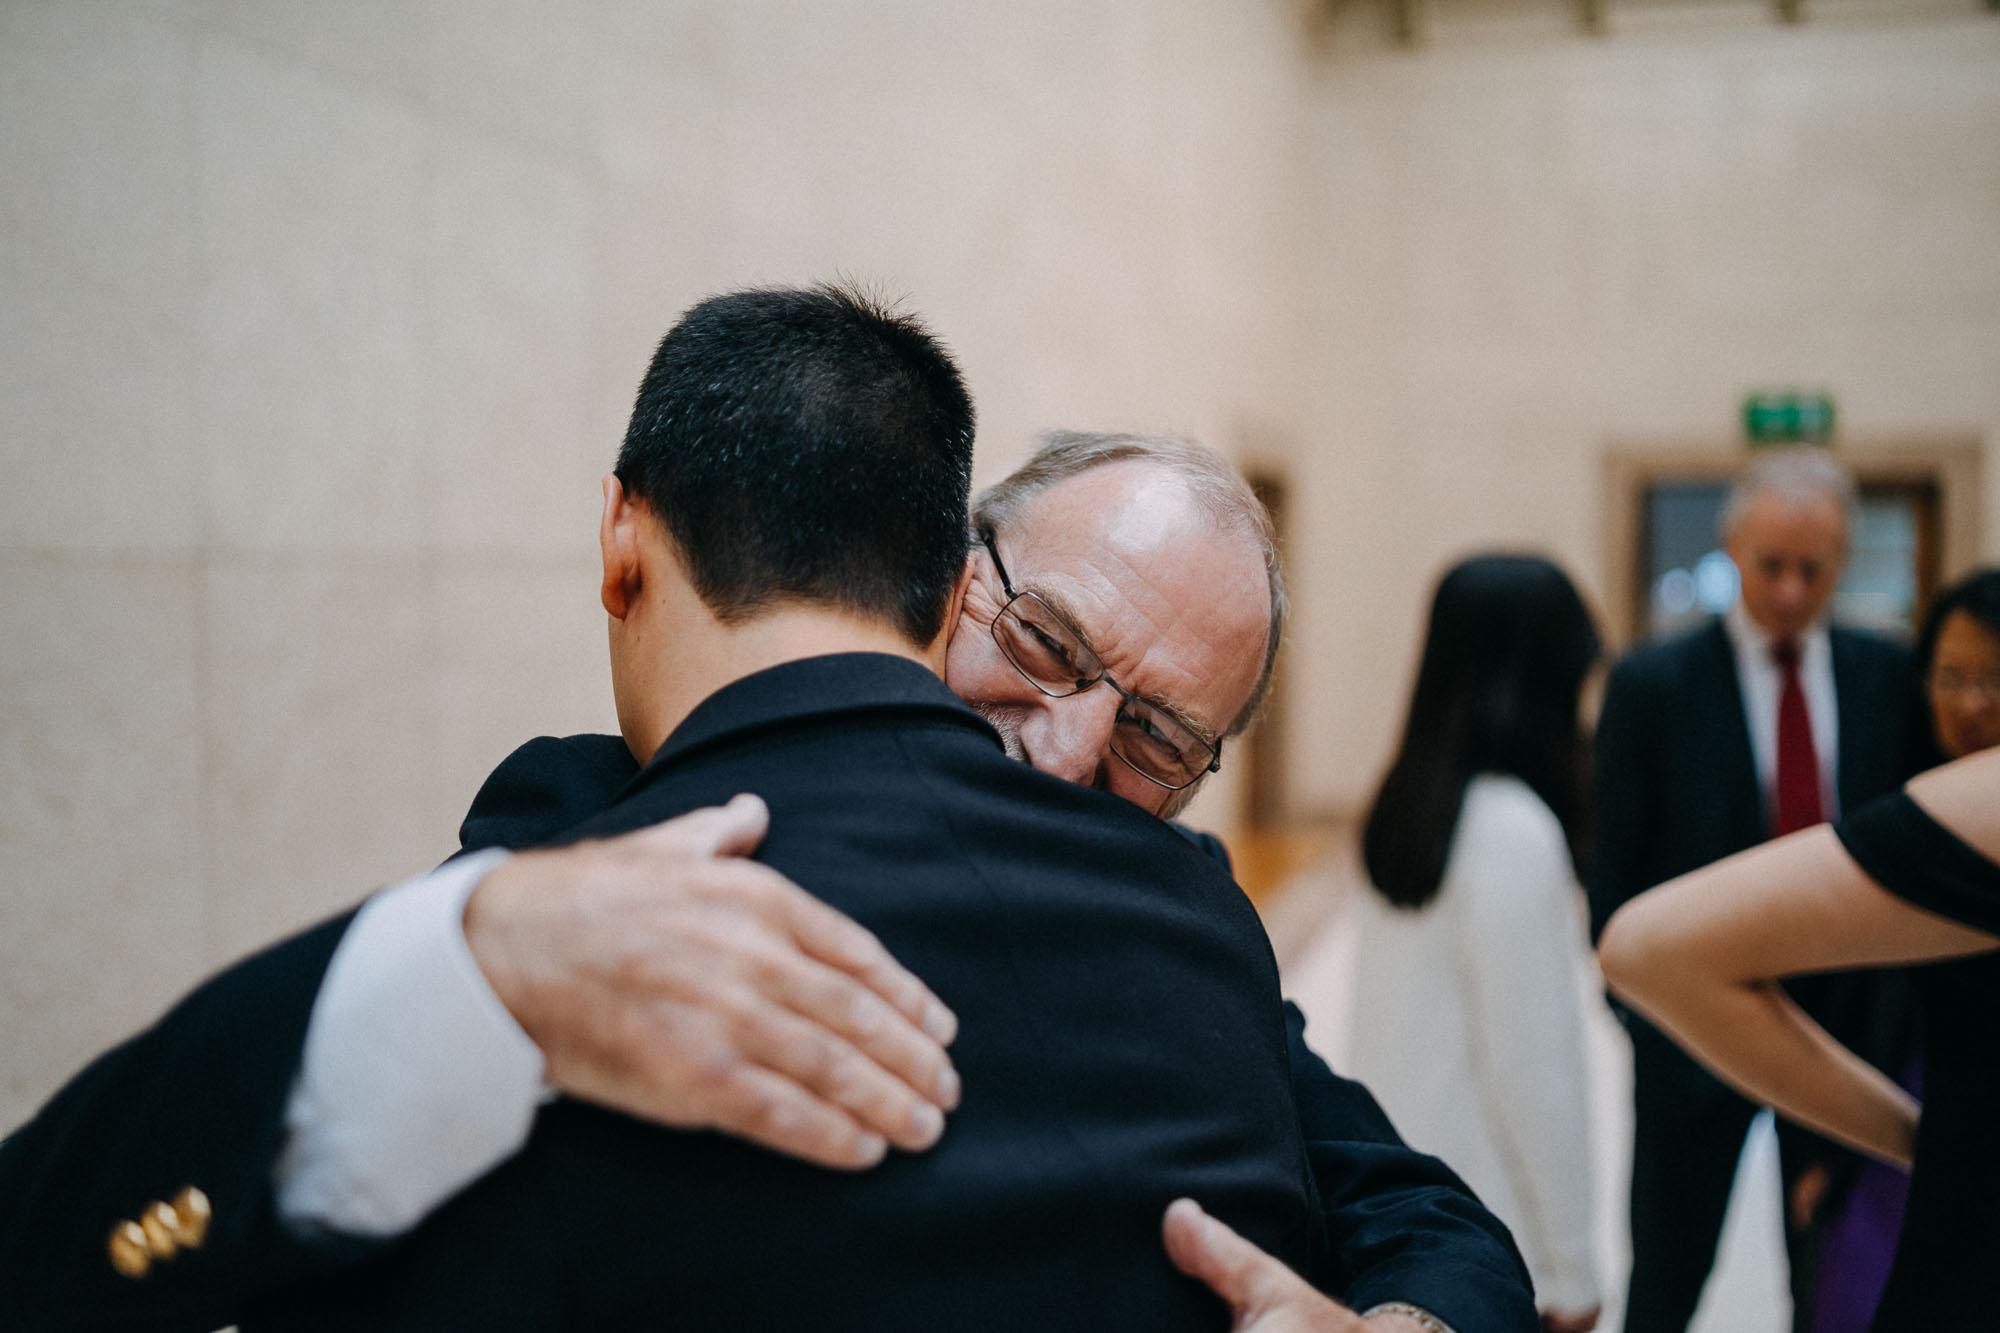 Hammersmith City Hall Wedding Photographer